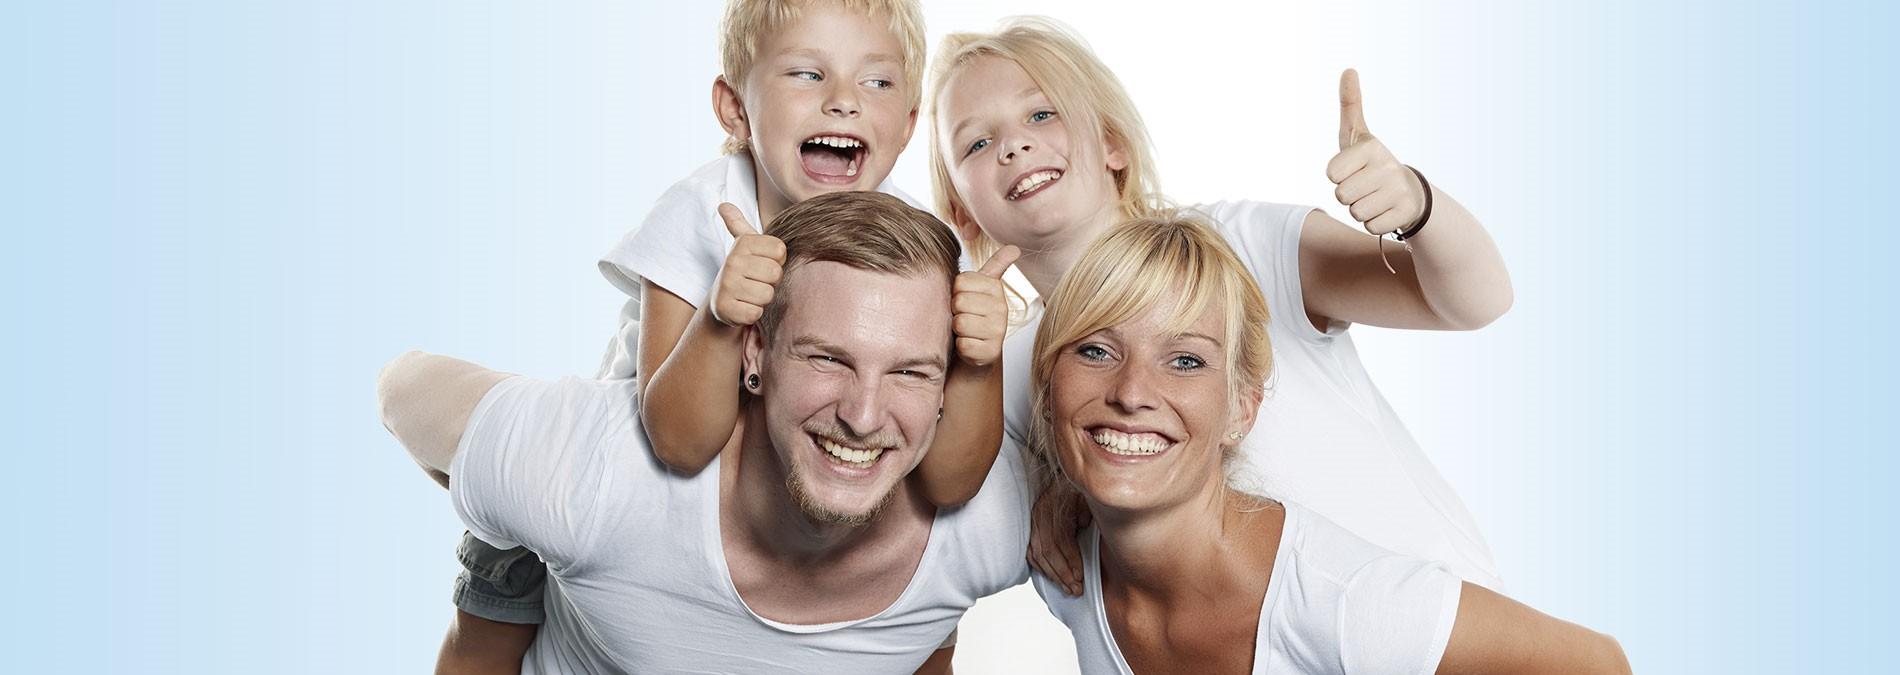 bild-familie